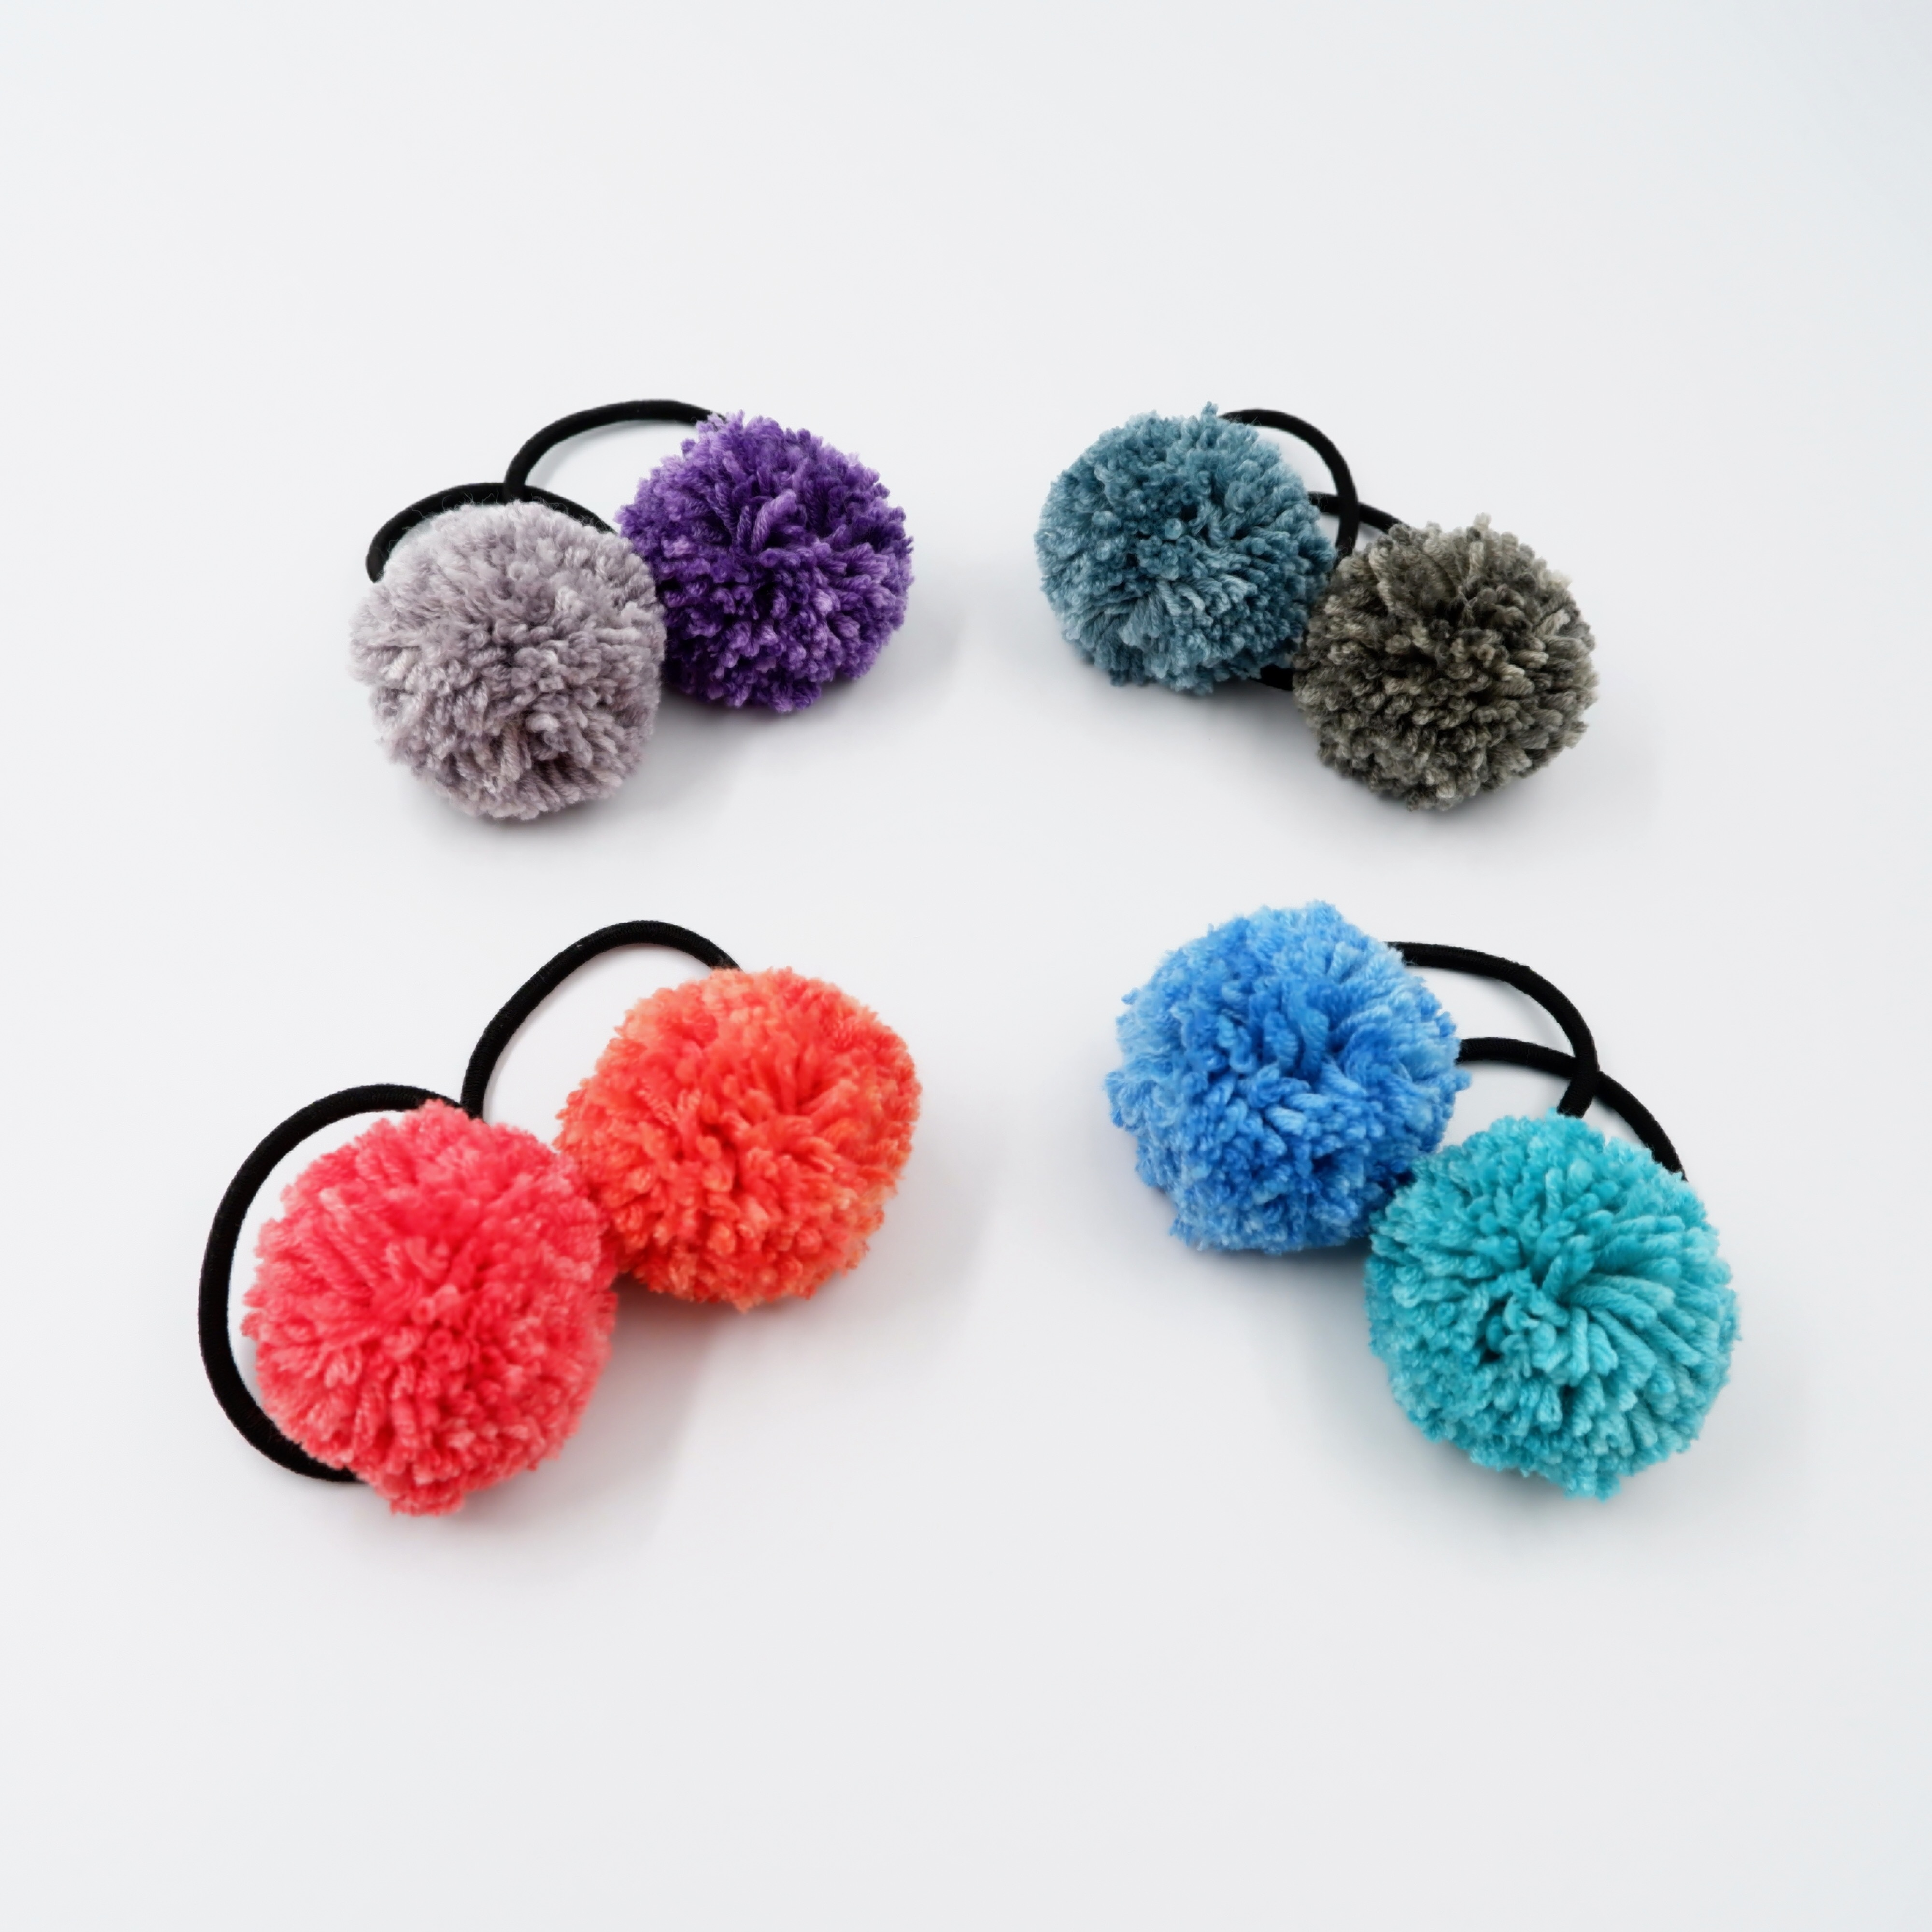 HanahanD 手編み雑貨 ポンポン ヘアゴム 毛糸